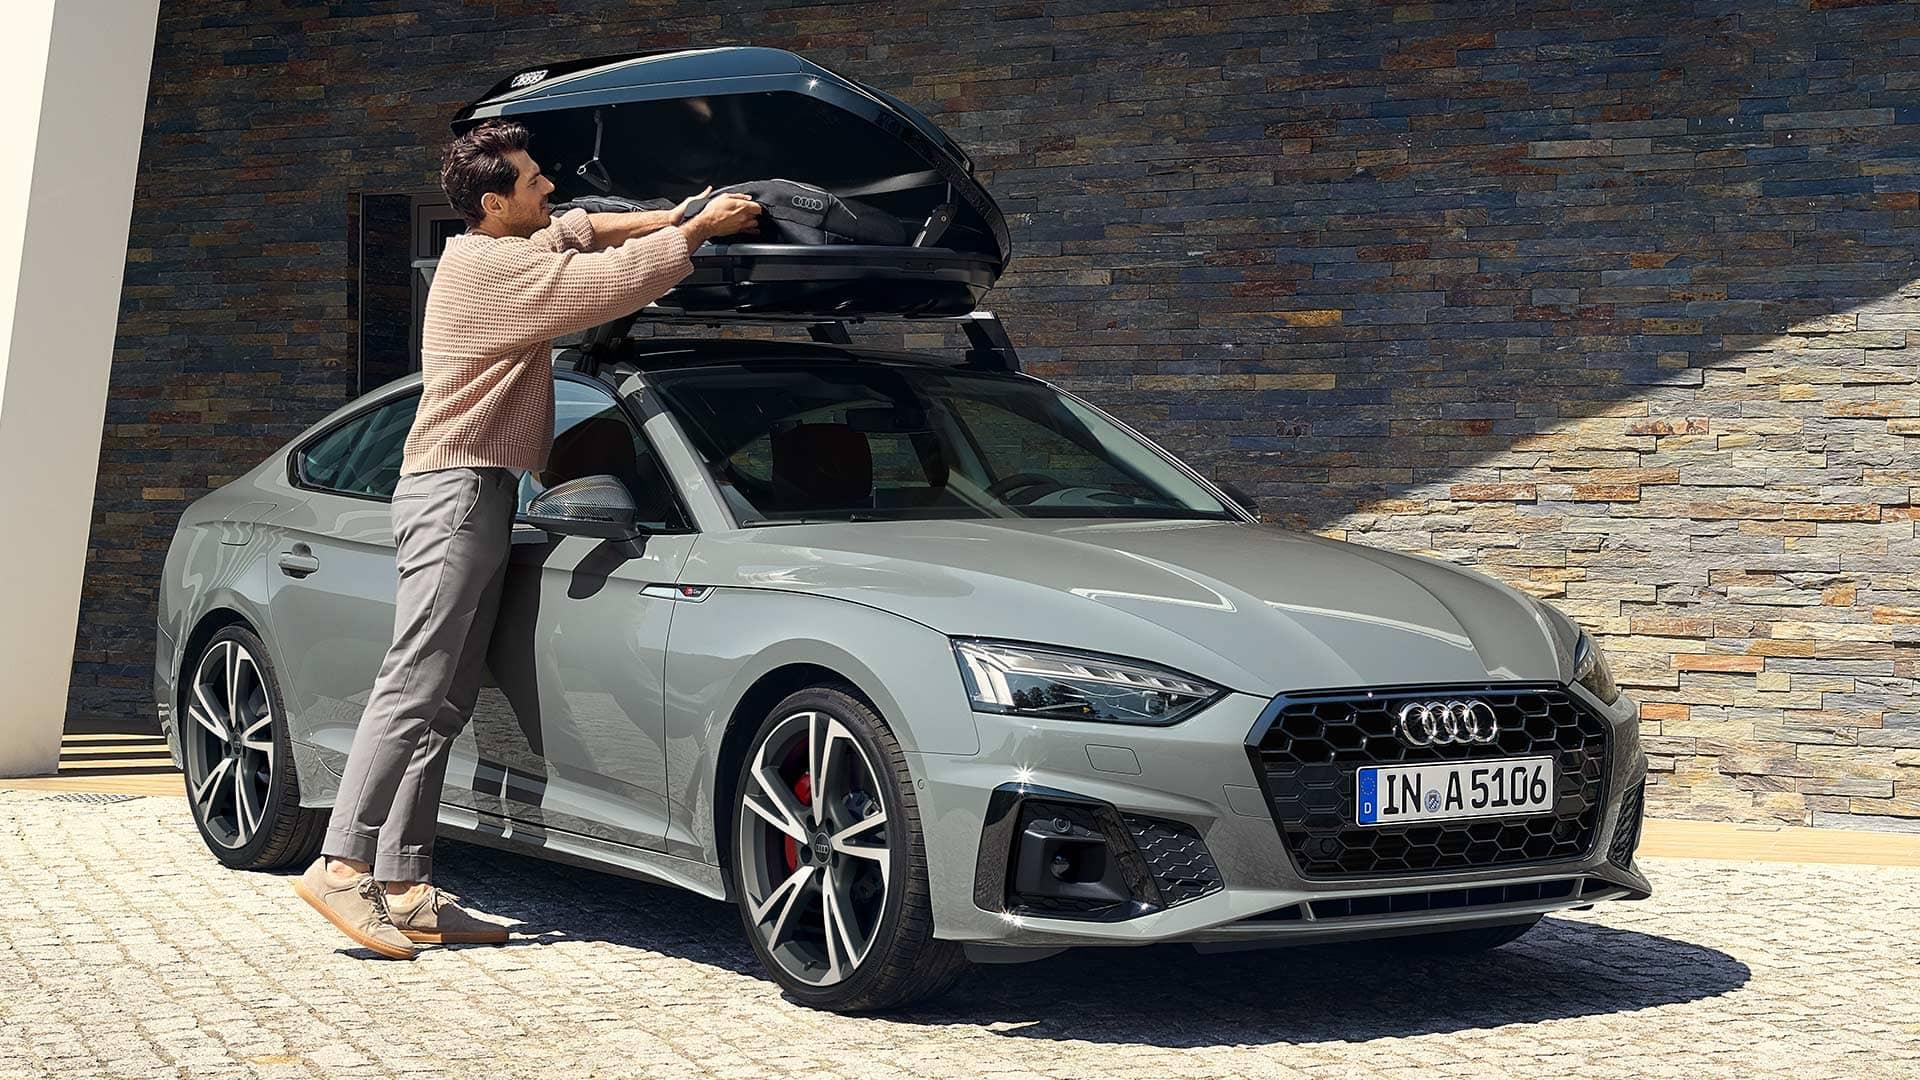 A5 Sportback A5 Audi Schweiz